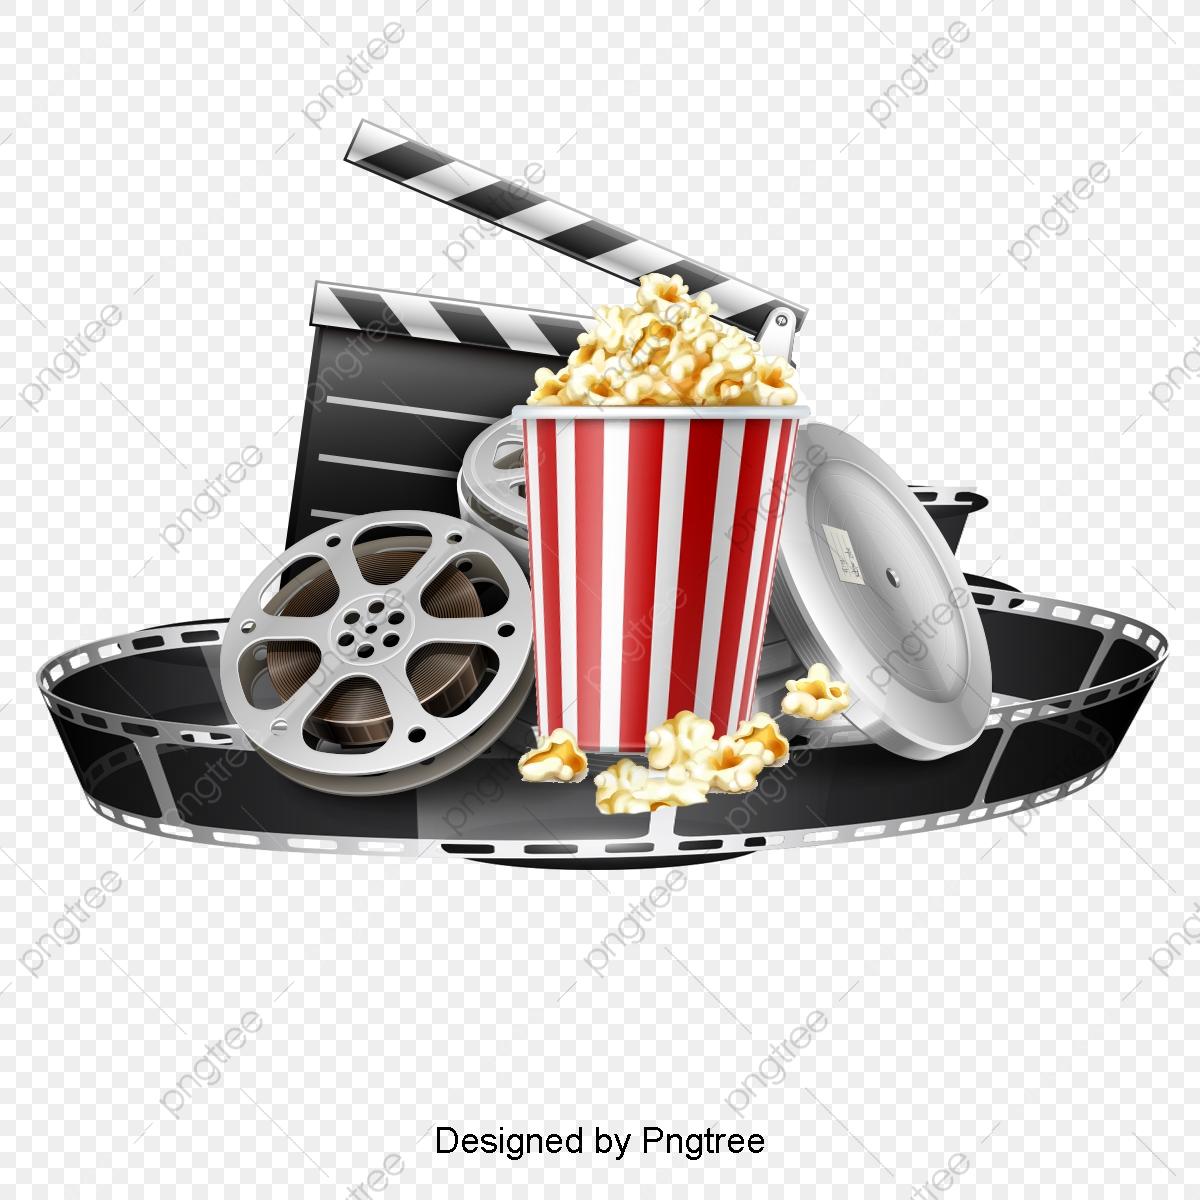 Popcorn Movie Film, Popcorn Clipart, Movie Clipart, Popcorn PNG.